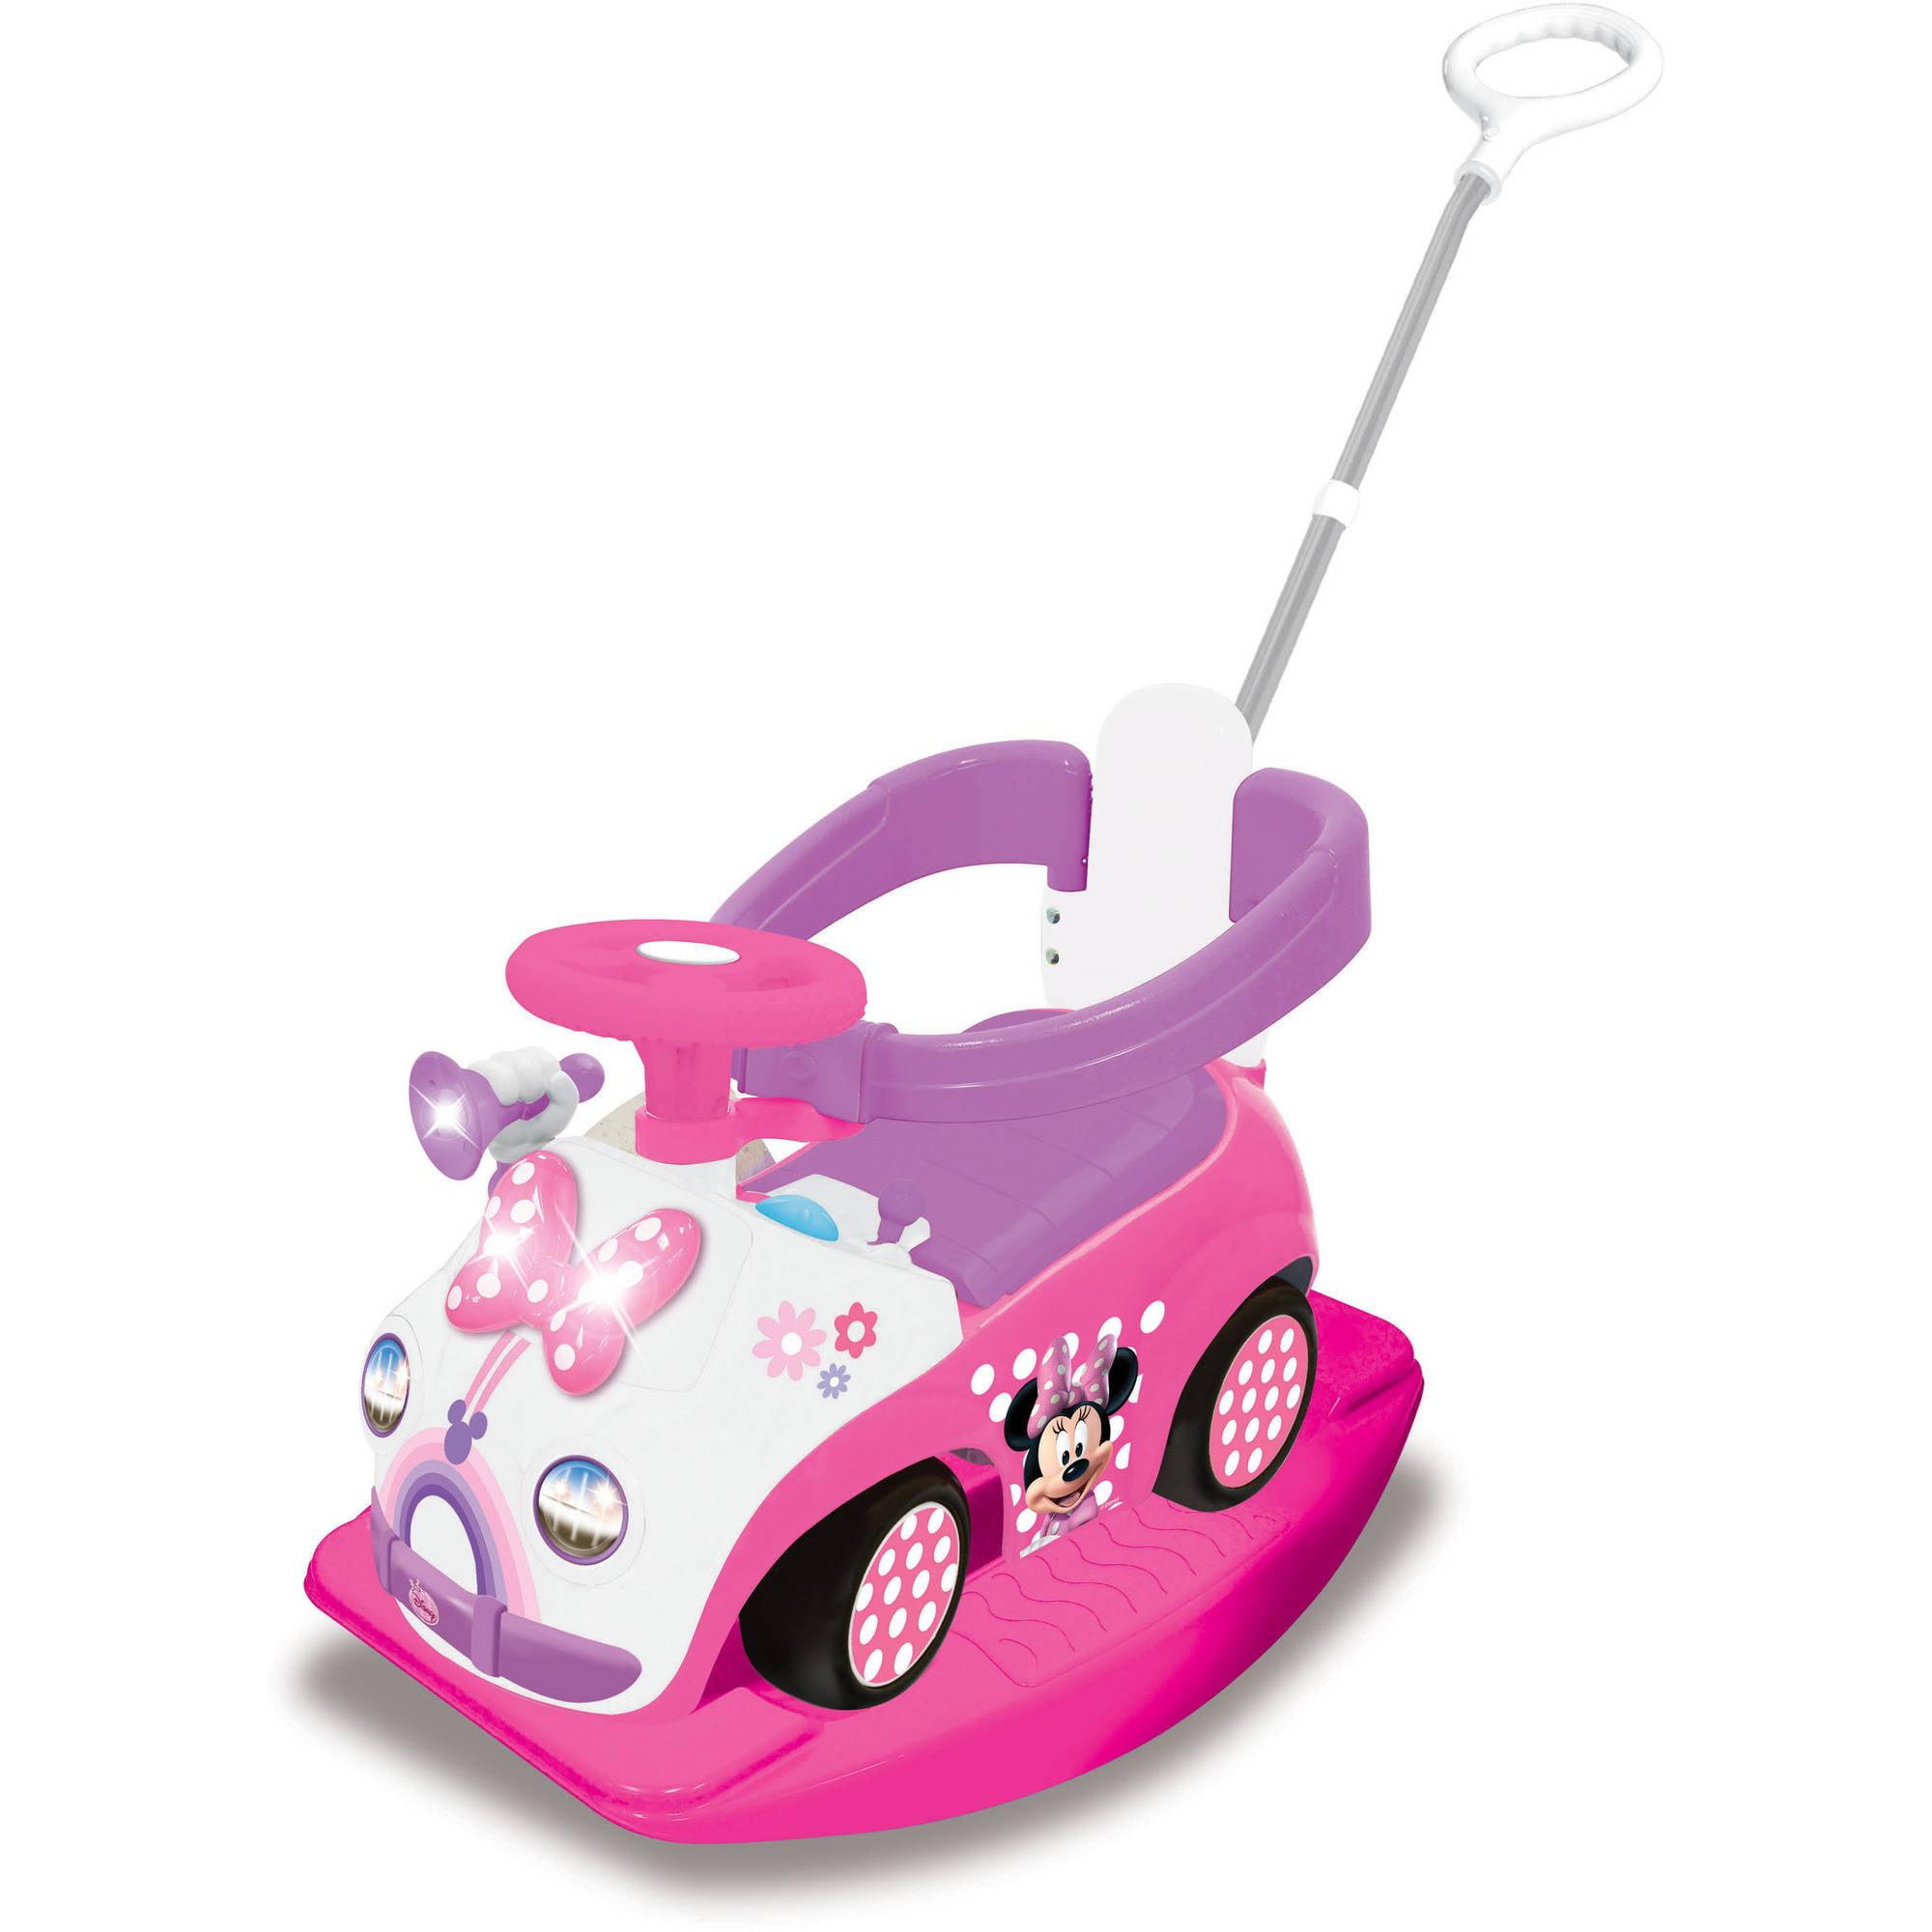 Kiddieland Disney Minnie Mouse 4-in-1 Activity Ride-On by Kiddieland